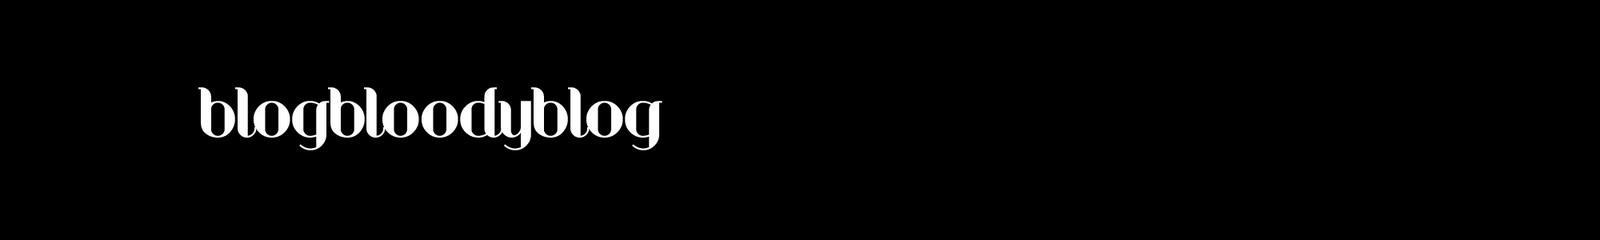 BLOGBLOODYBLOG